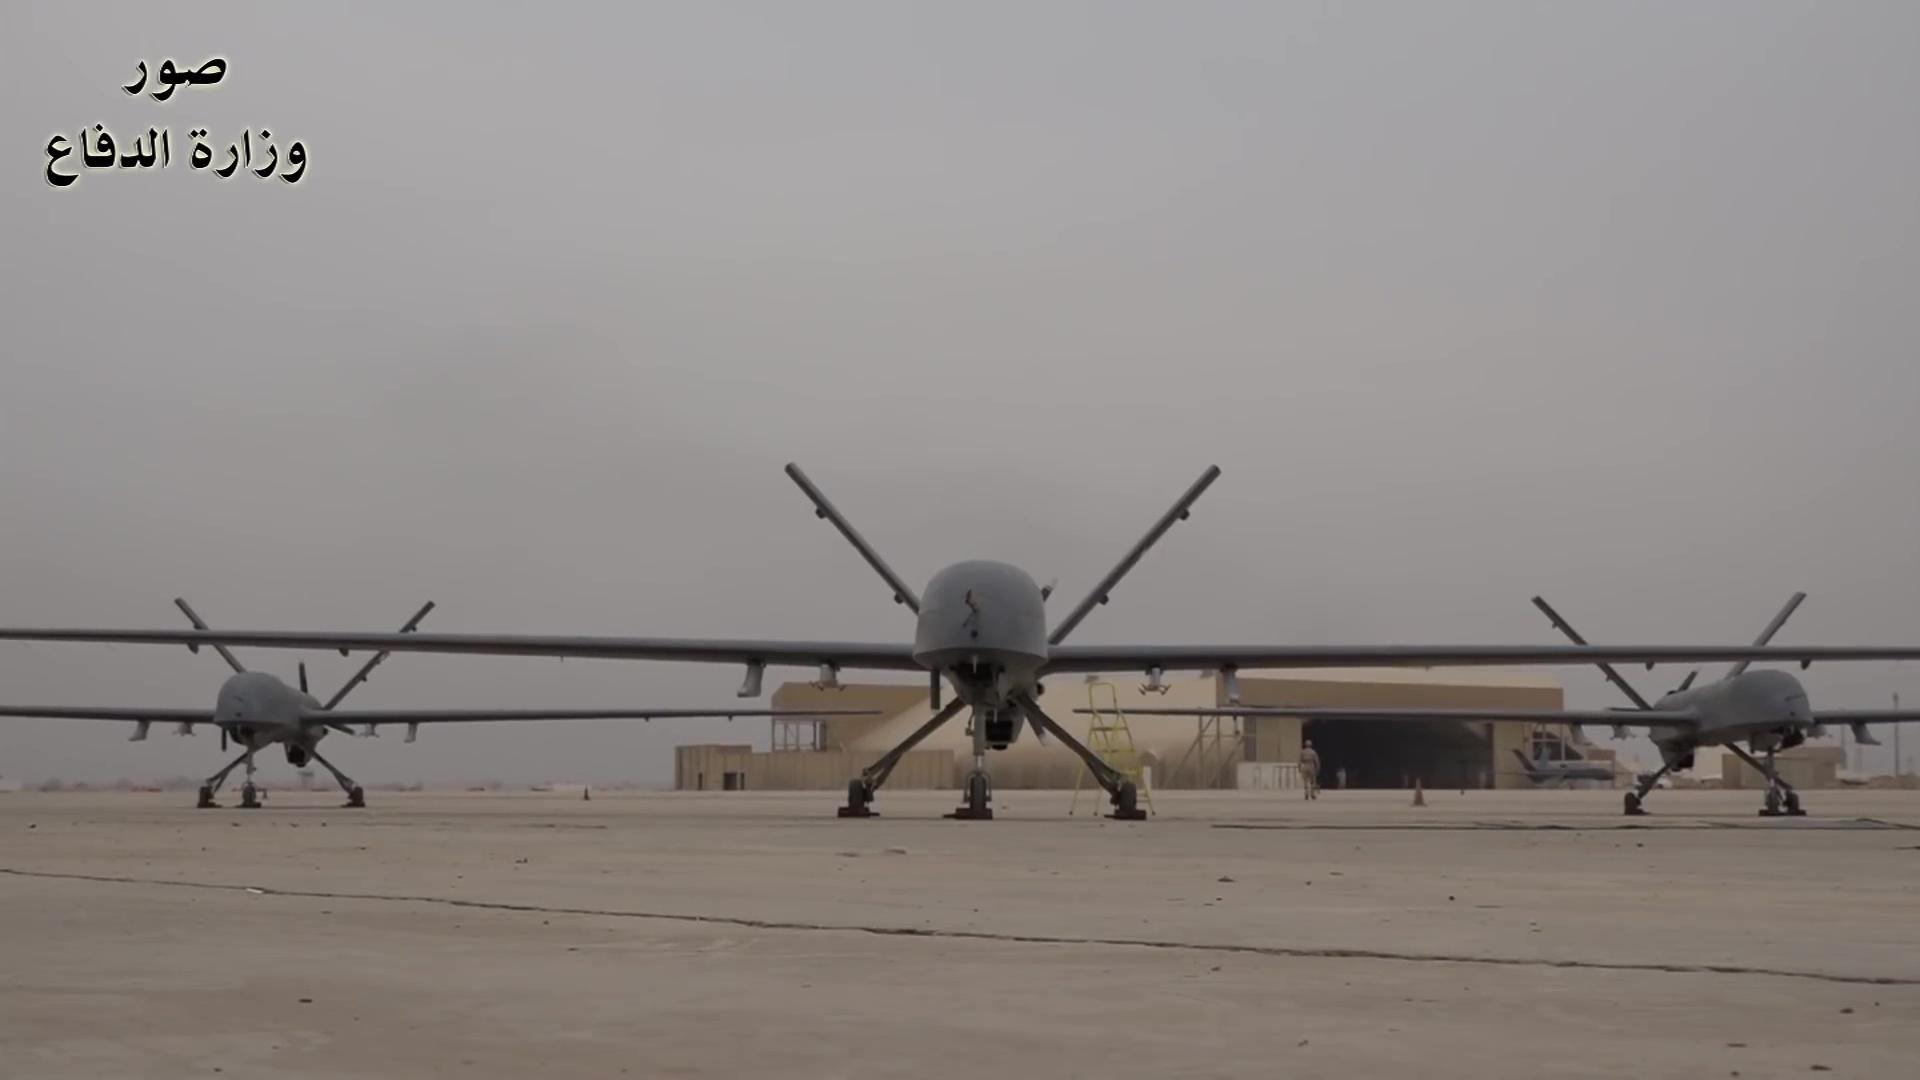 مسابقة رمضان الطائرات دون طيار  2018-02-18-Les-officiers-irakiens-parlent-du-drone-CH-4-01